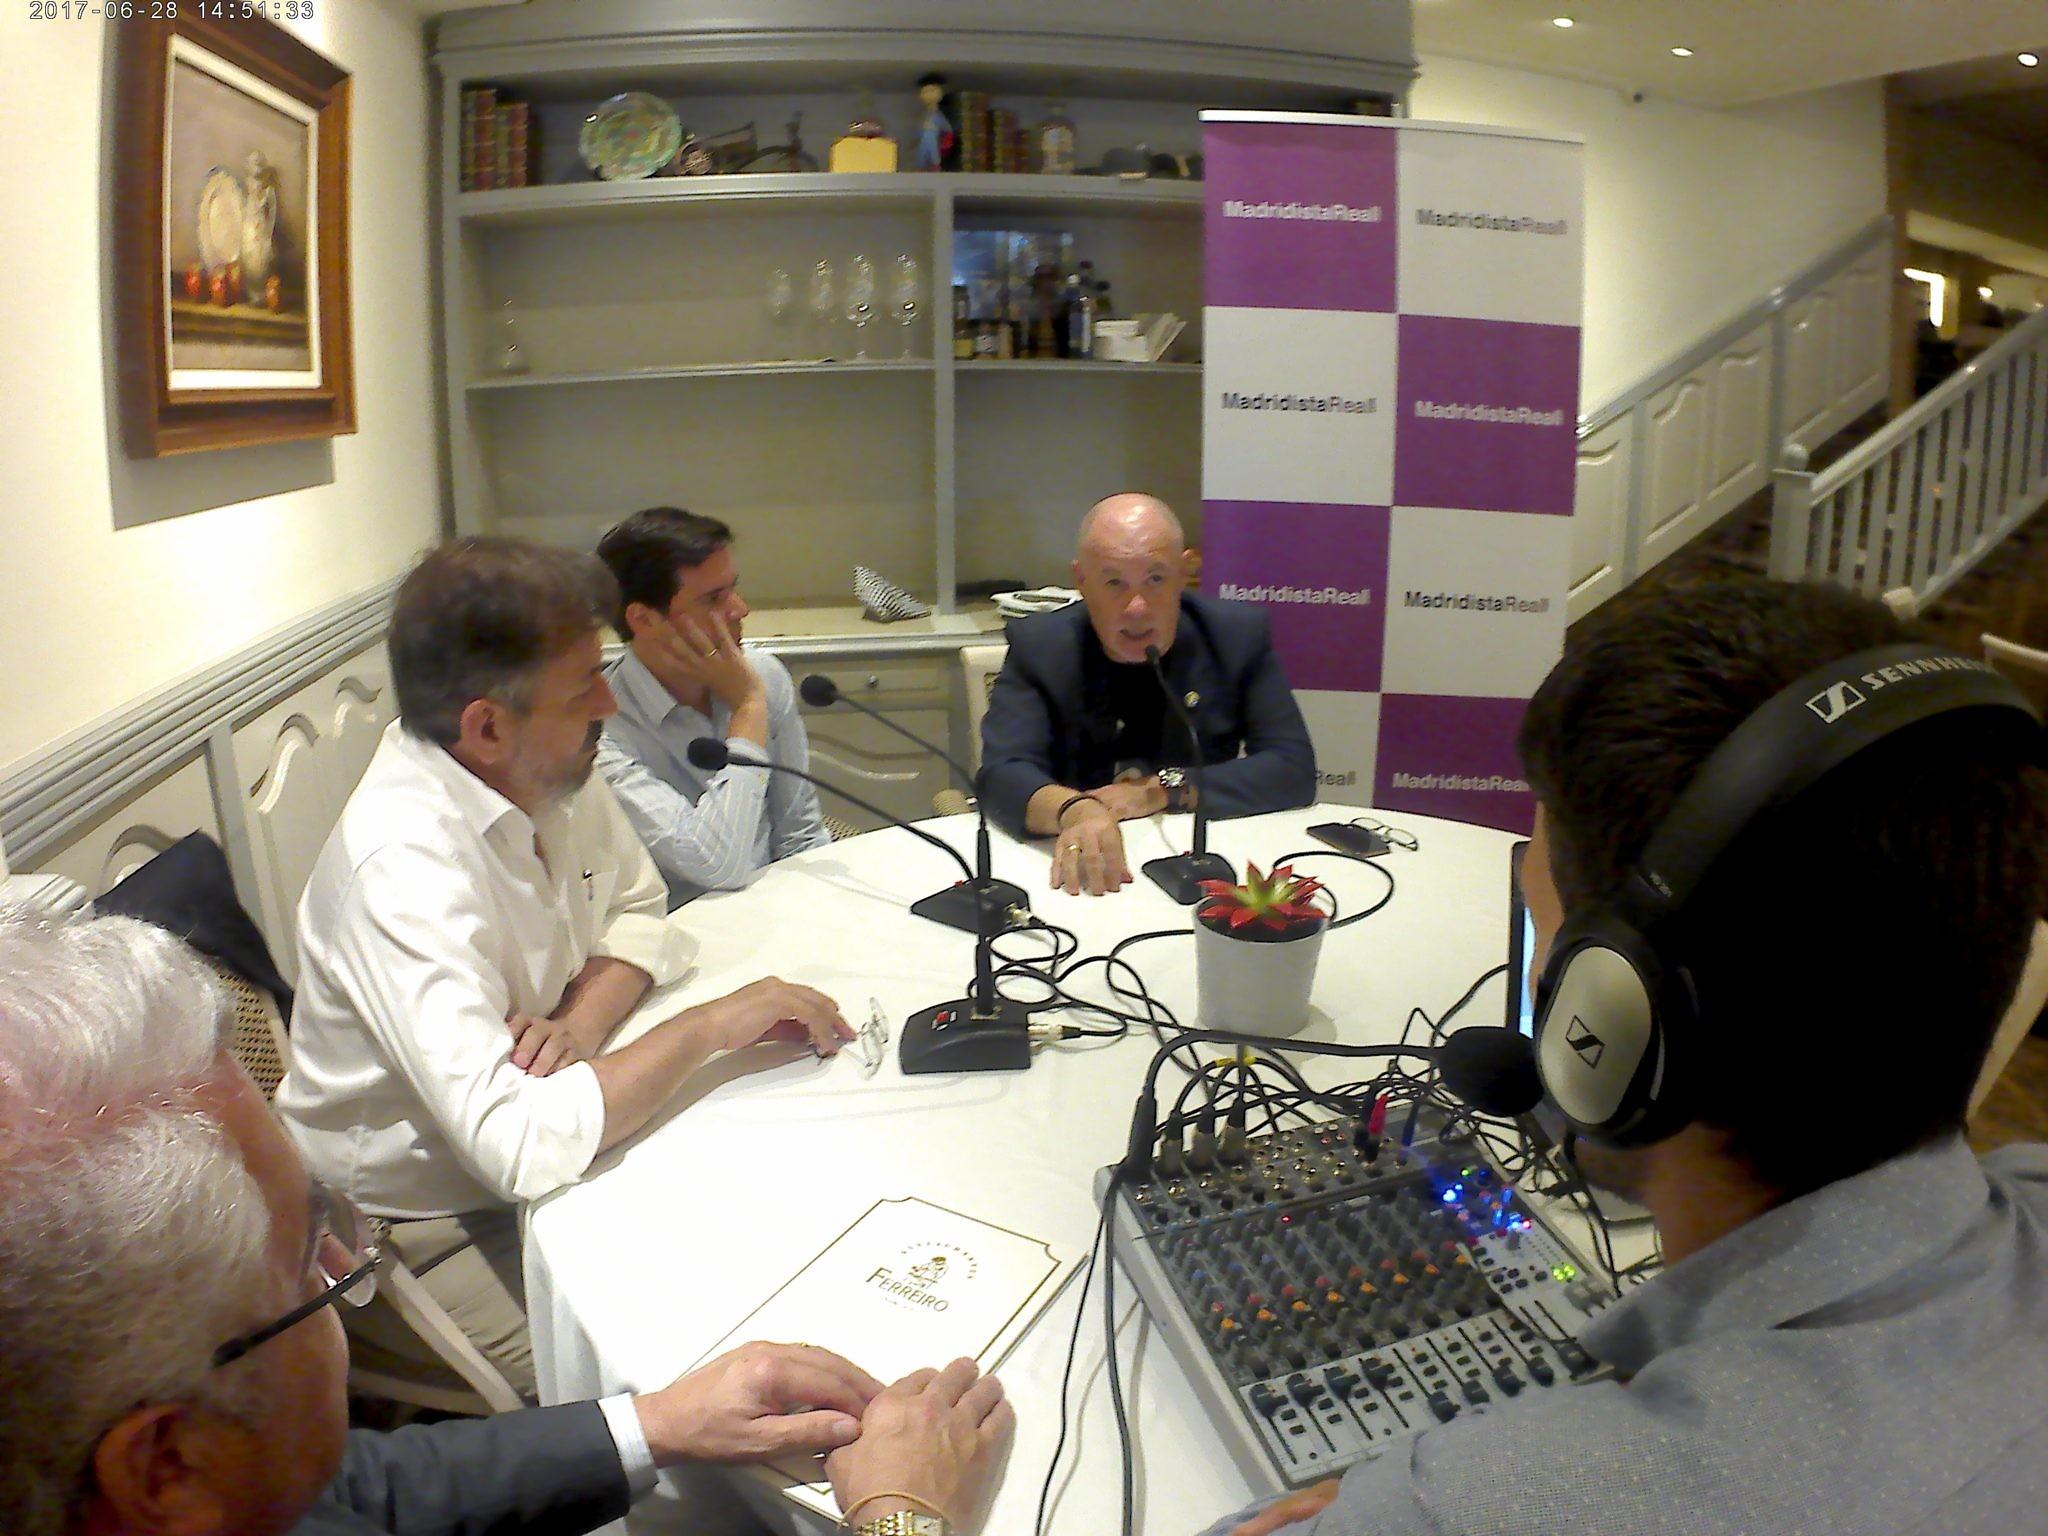 Tertulia Madridista Real 2 (07/06/2017) | La Duodécima